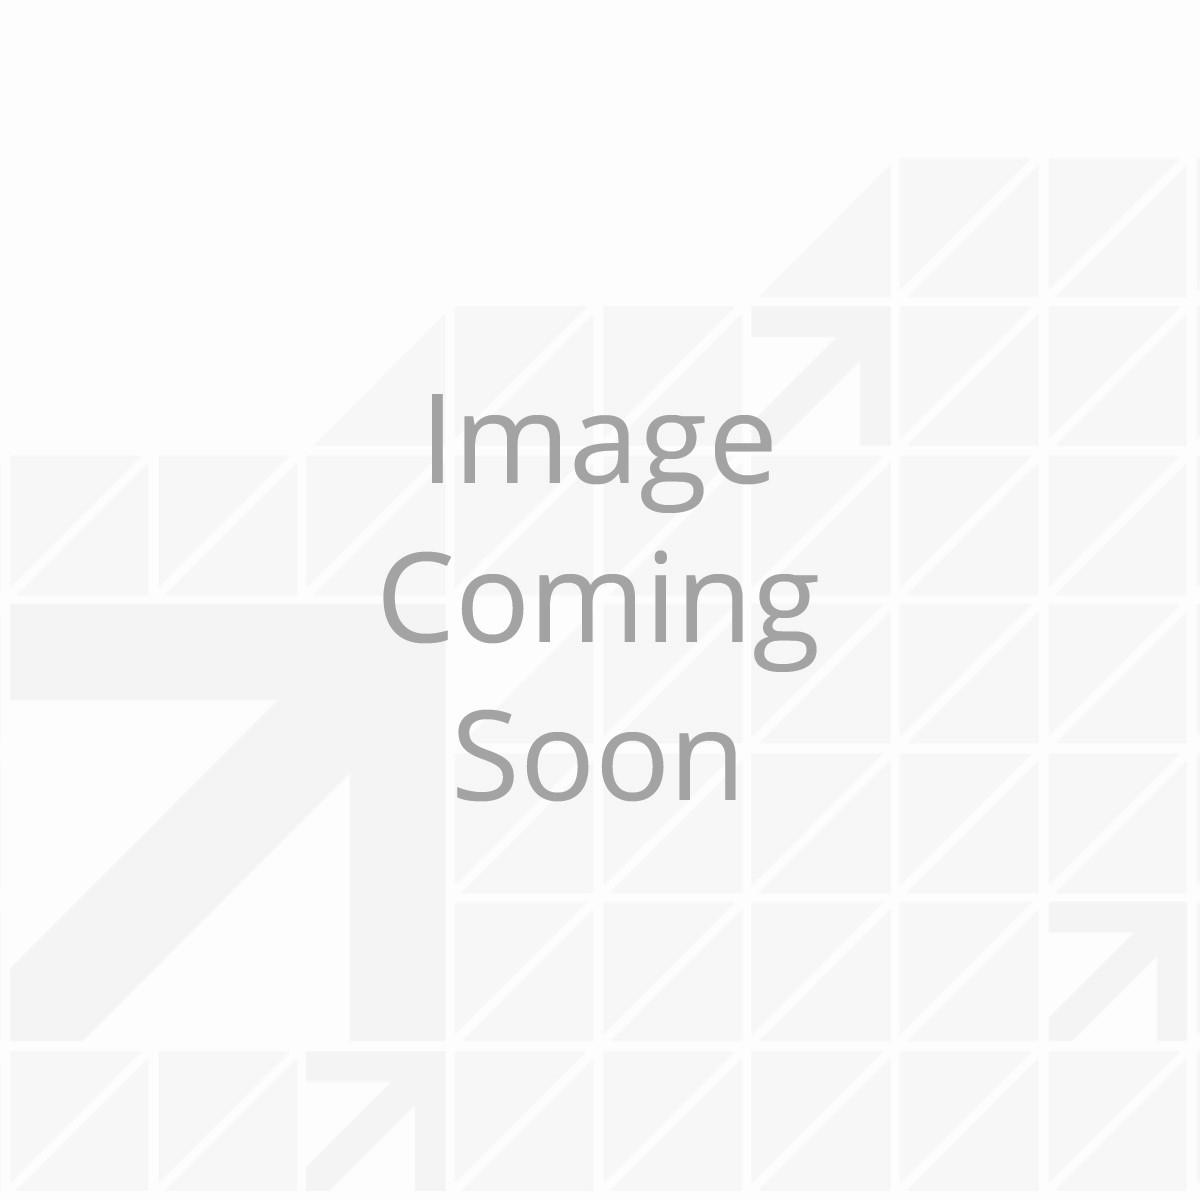 21' Destination Awning Roller Assembly - Black Fade (Black Shield)